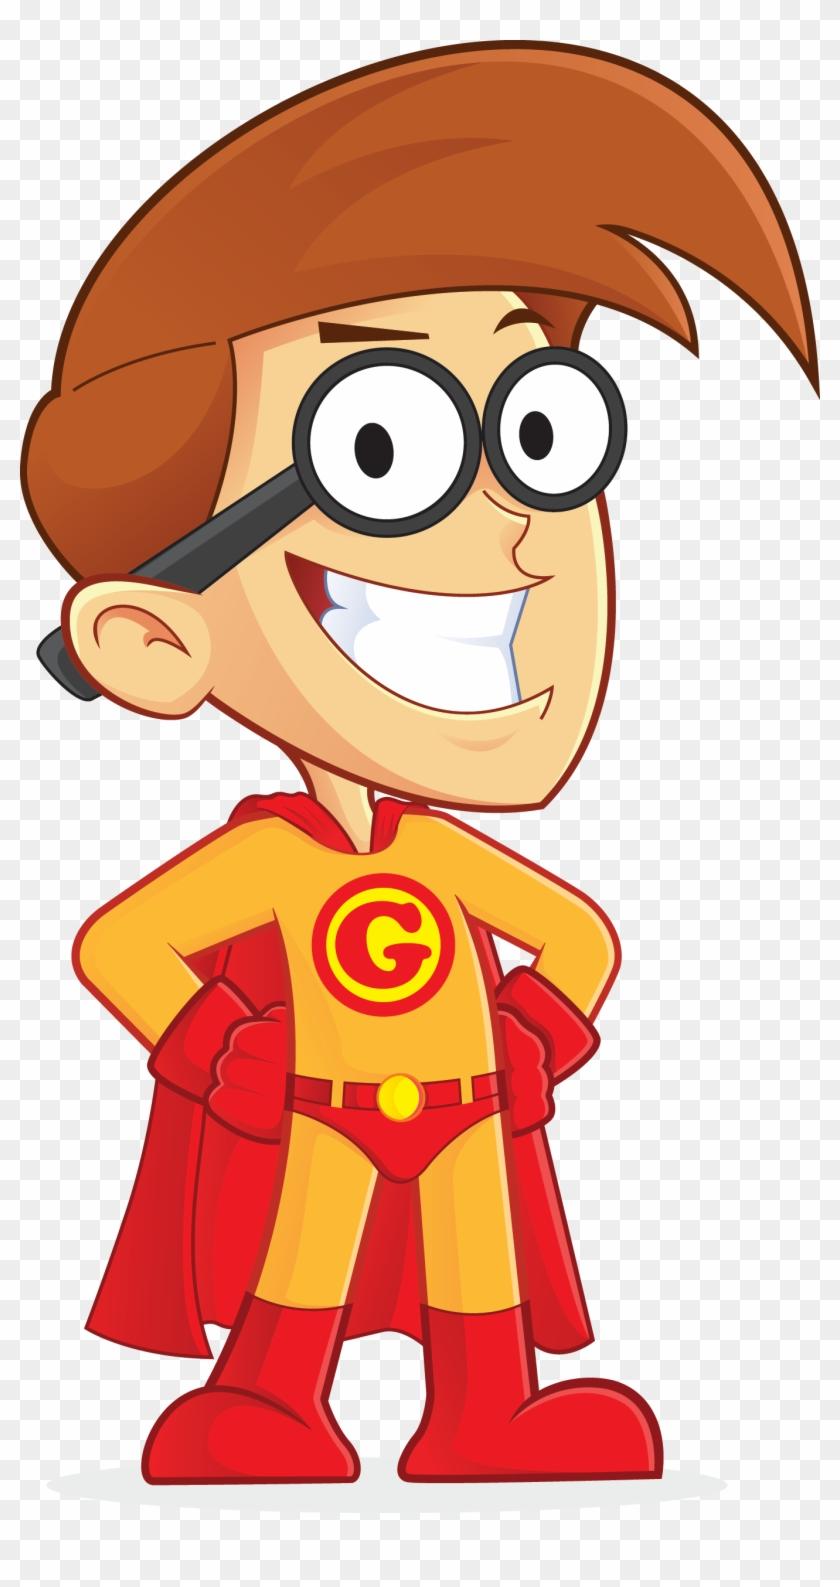 Free Superhero Nerd Geek People High Resolution Clip - Simple Logic Crossword Puzzles Volume 2 #124647